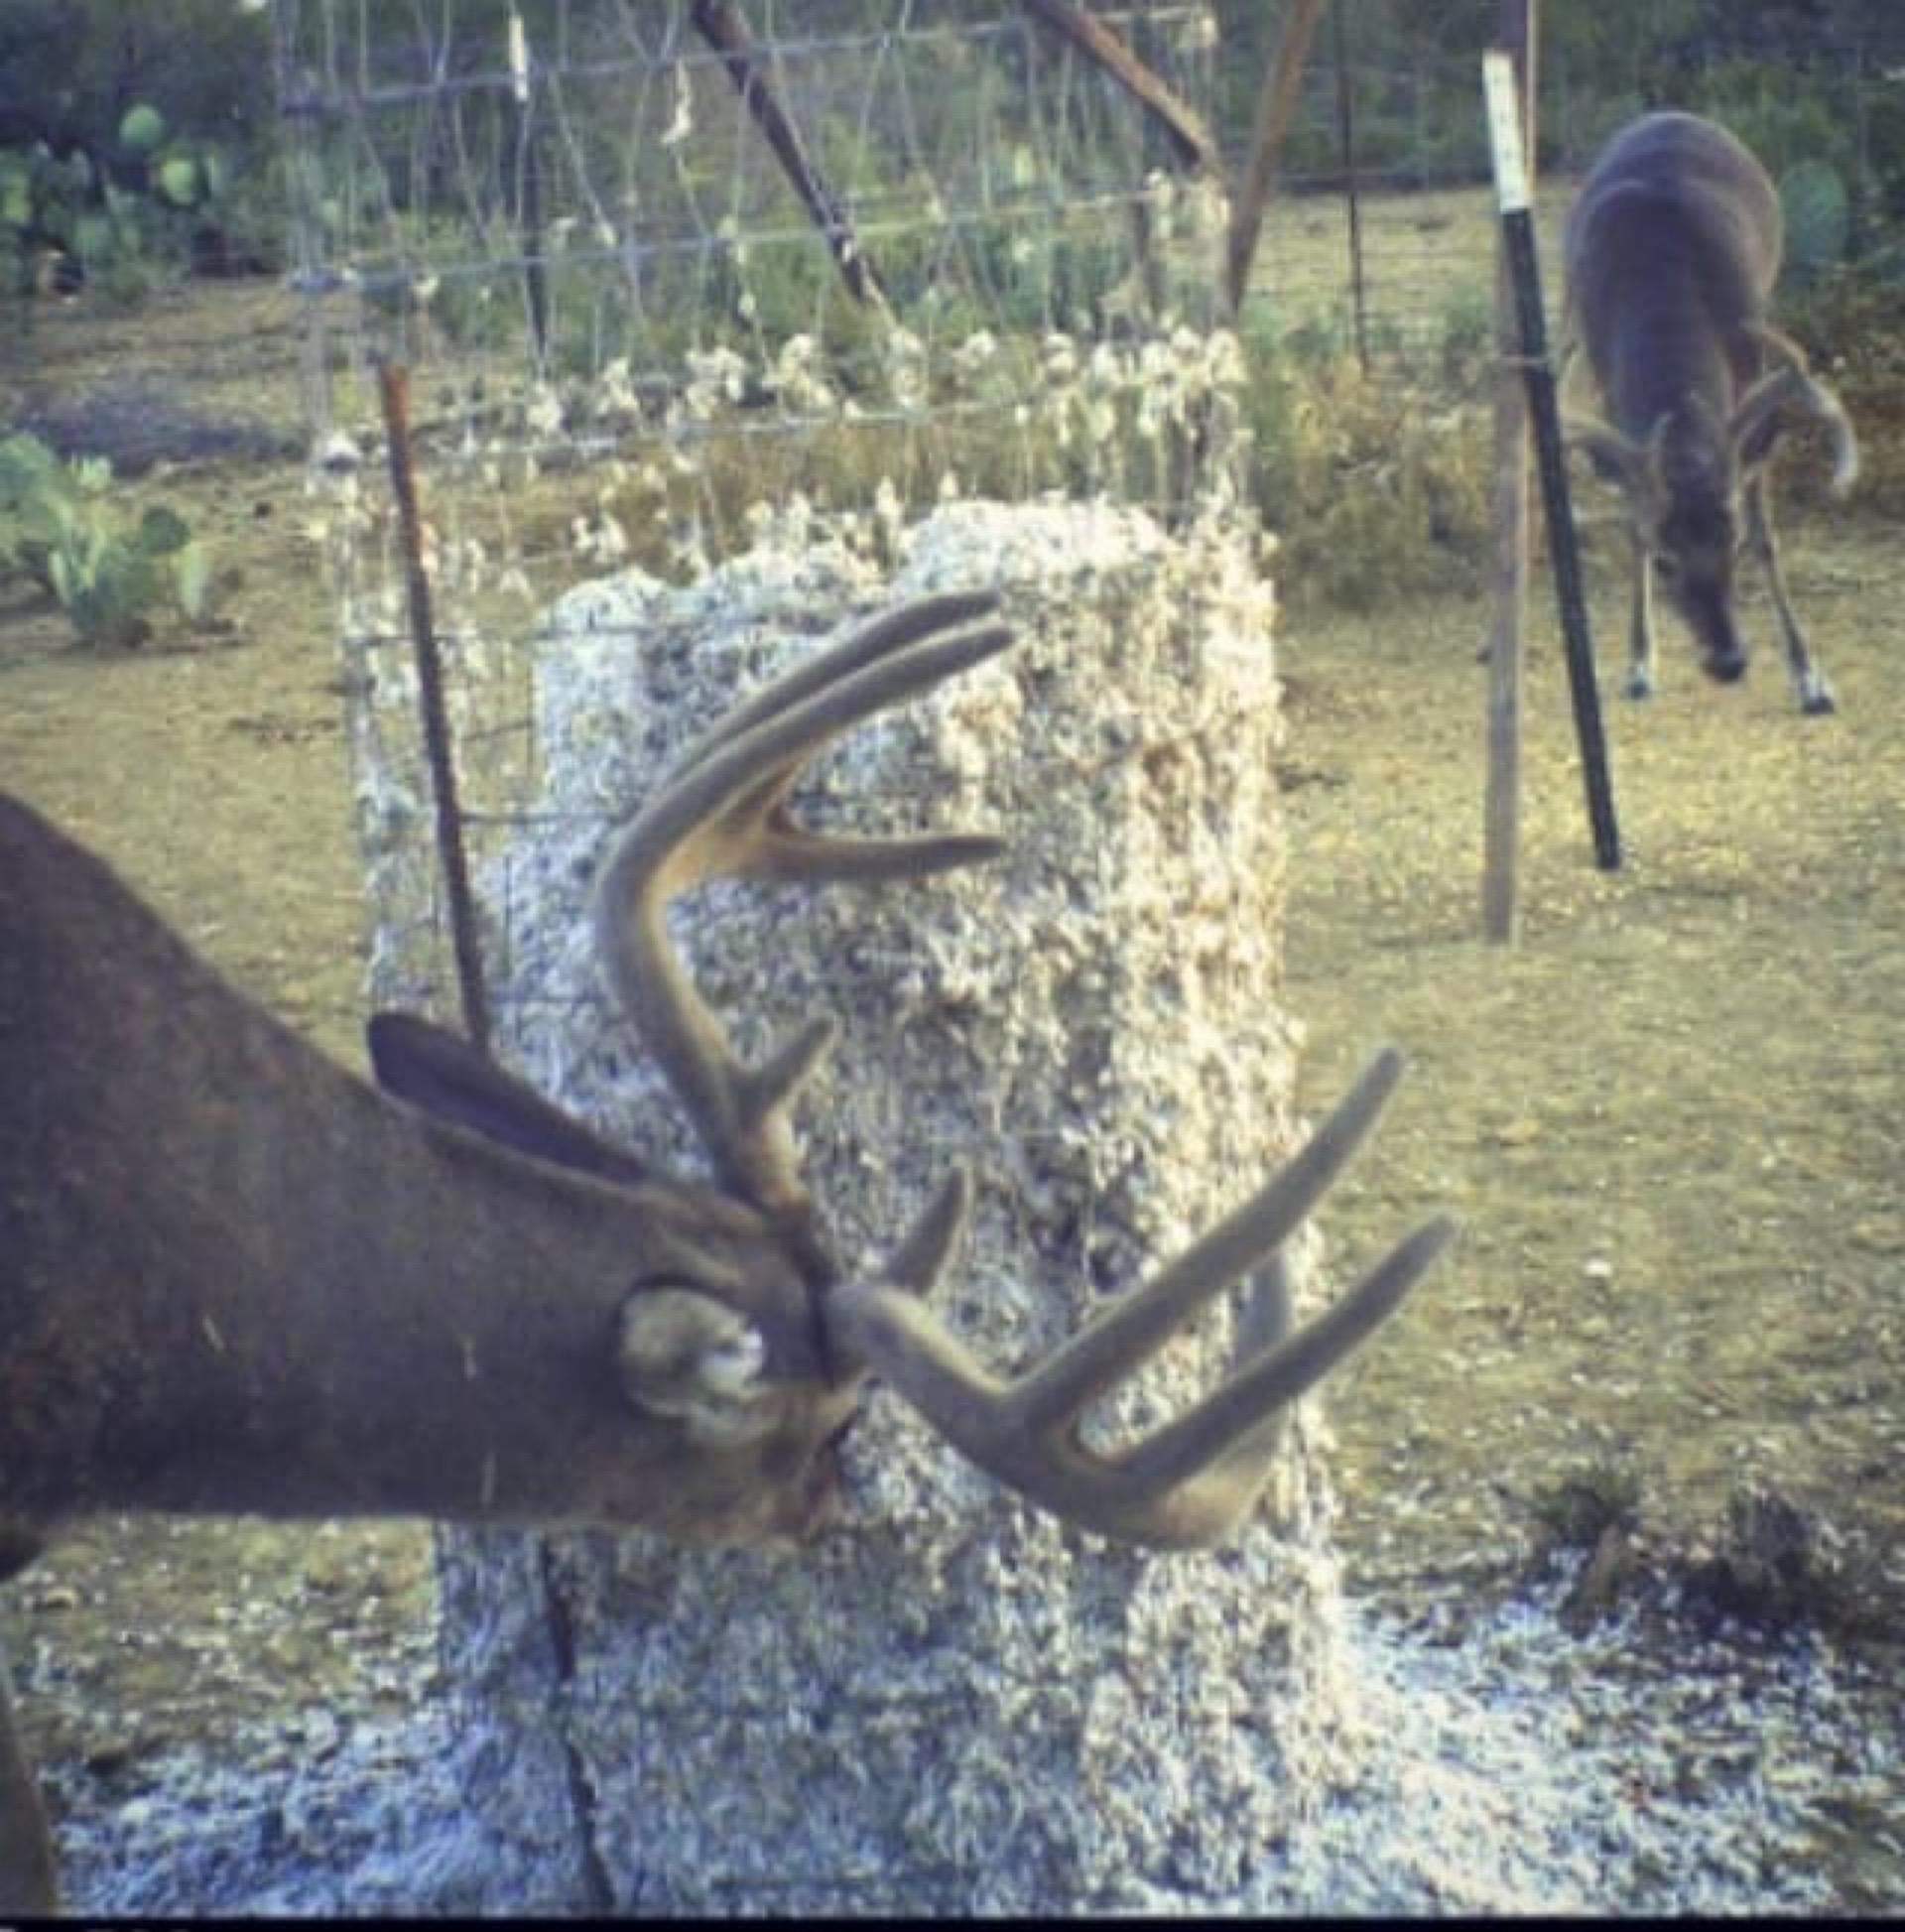 Deer eating Fortified Cottonseed